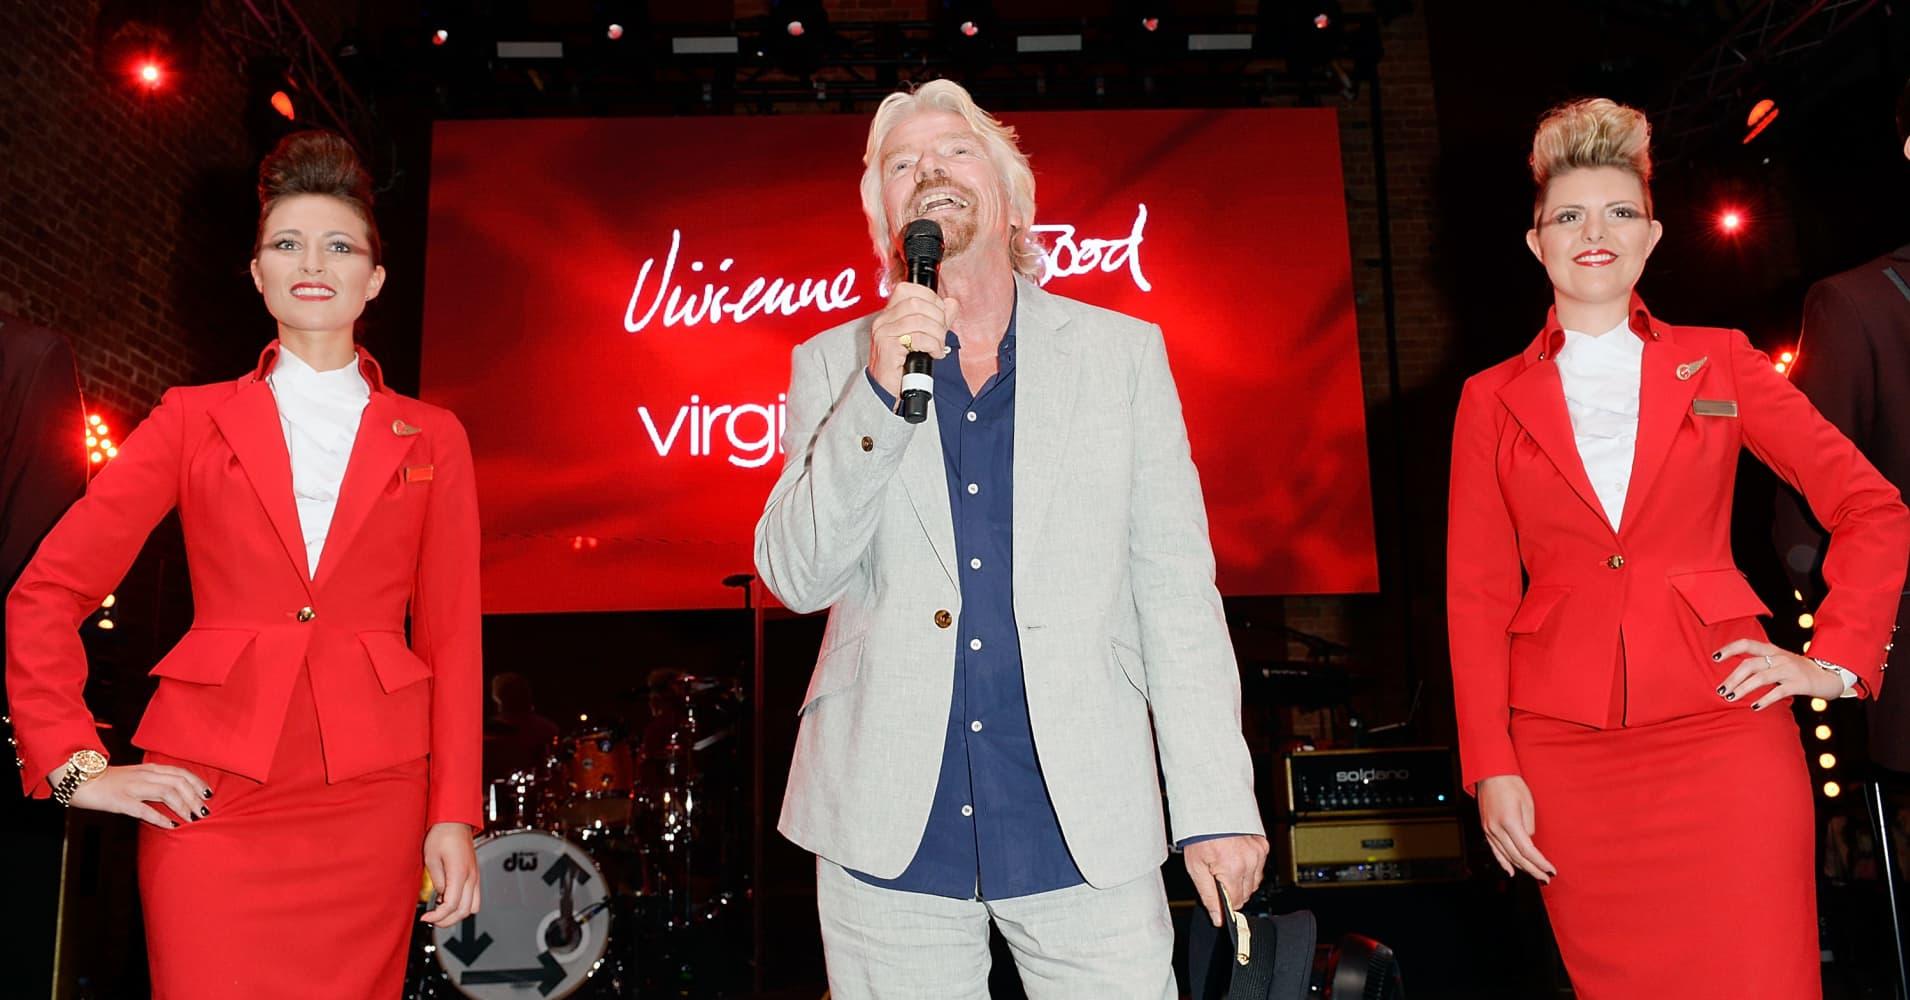 Virgin Atlantic drops mandatory makeup rule for female flight attendants